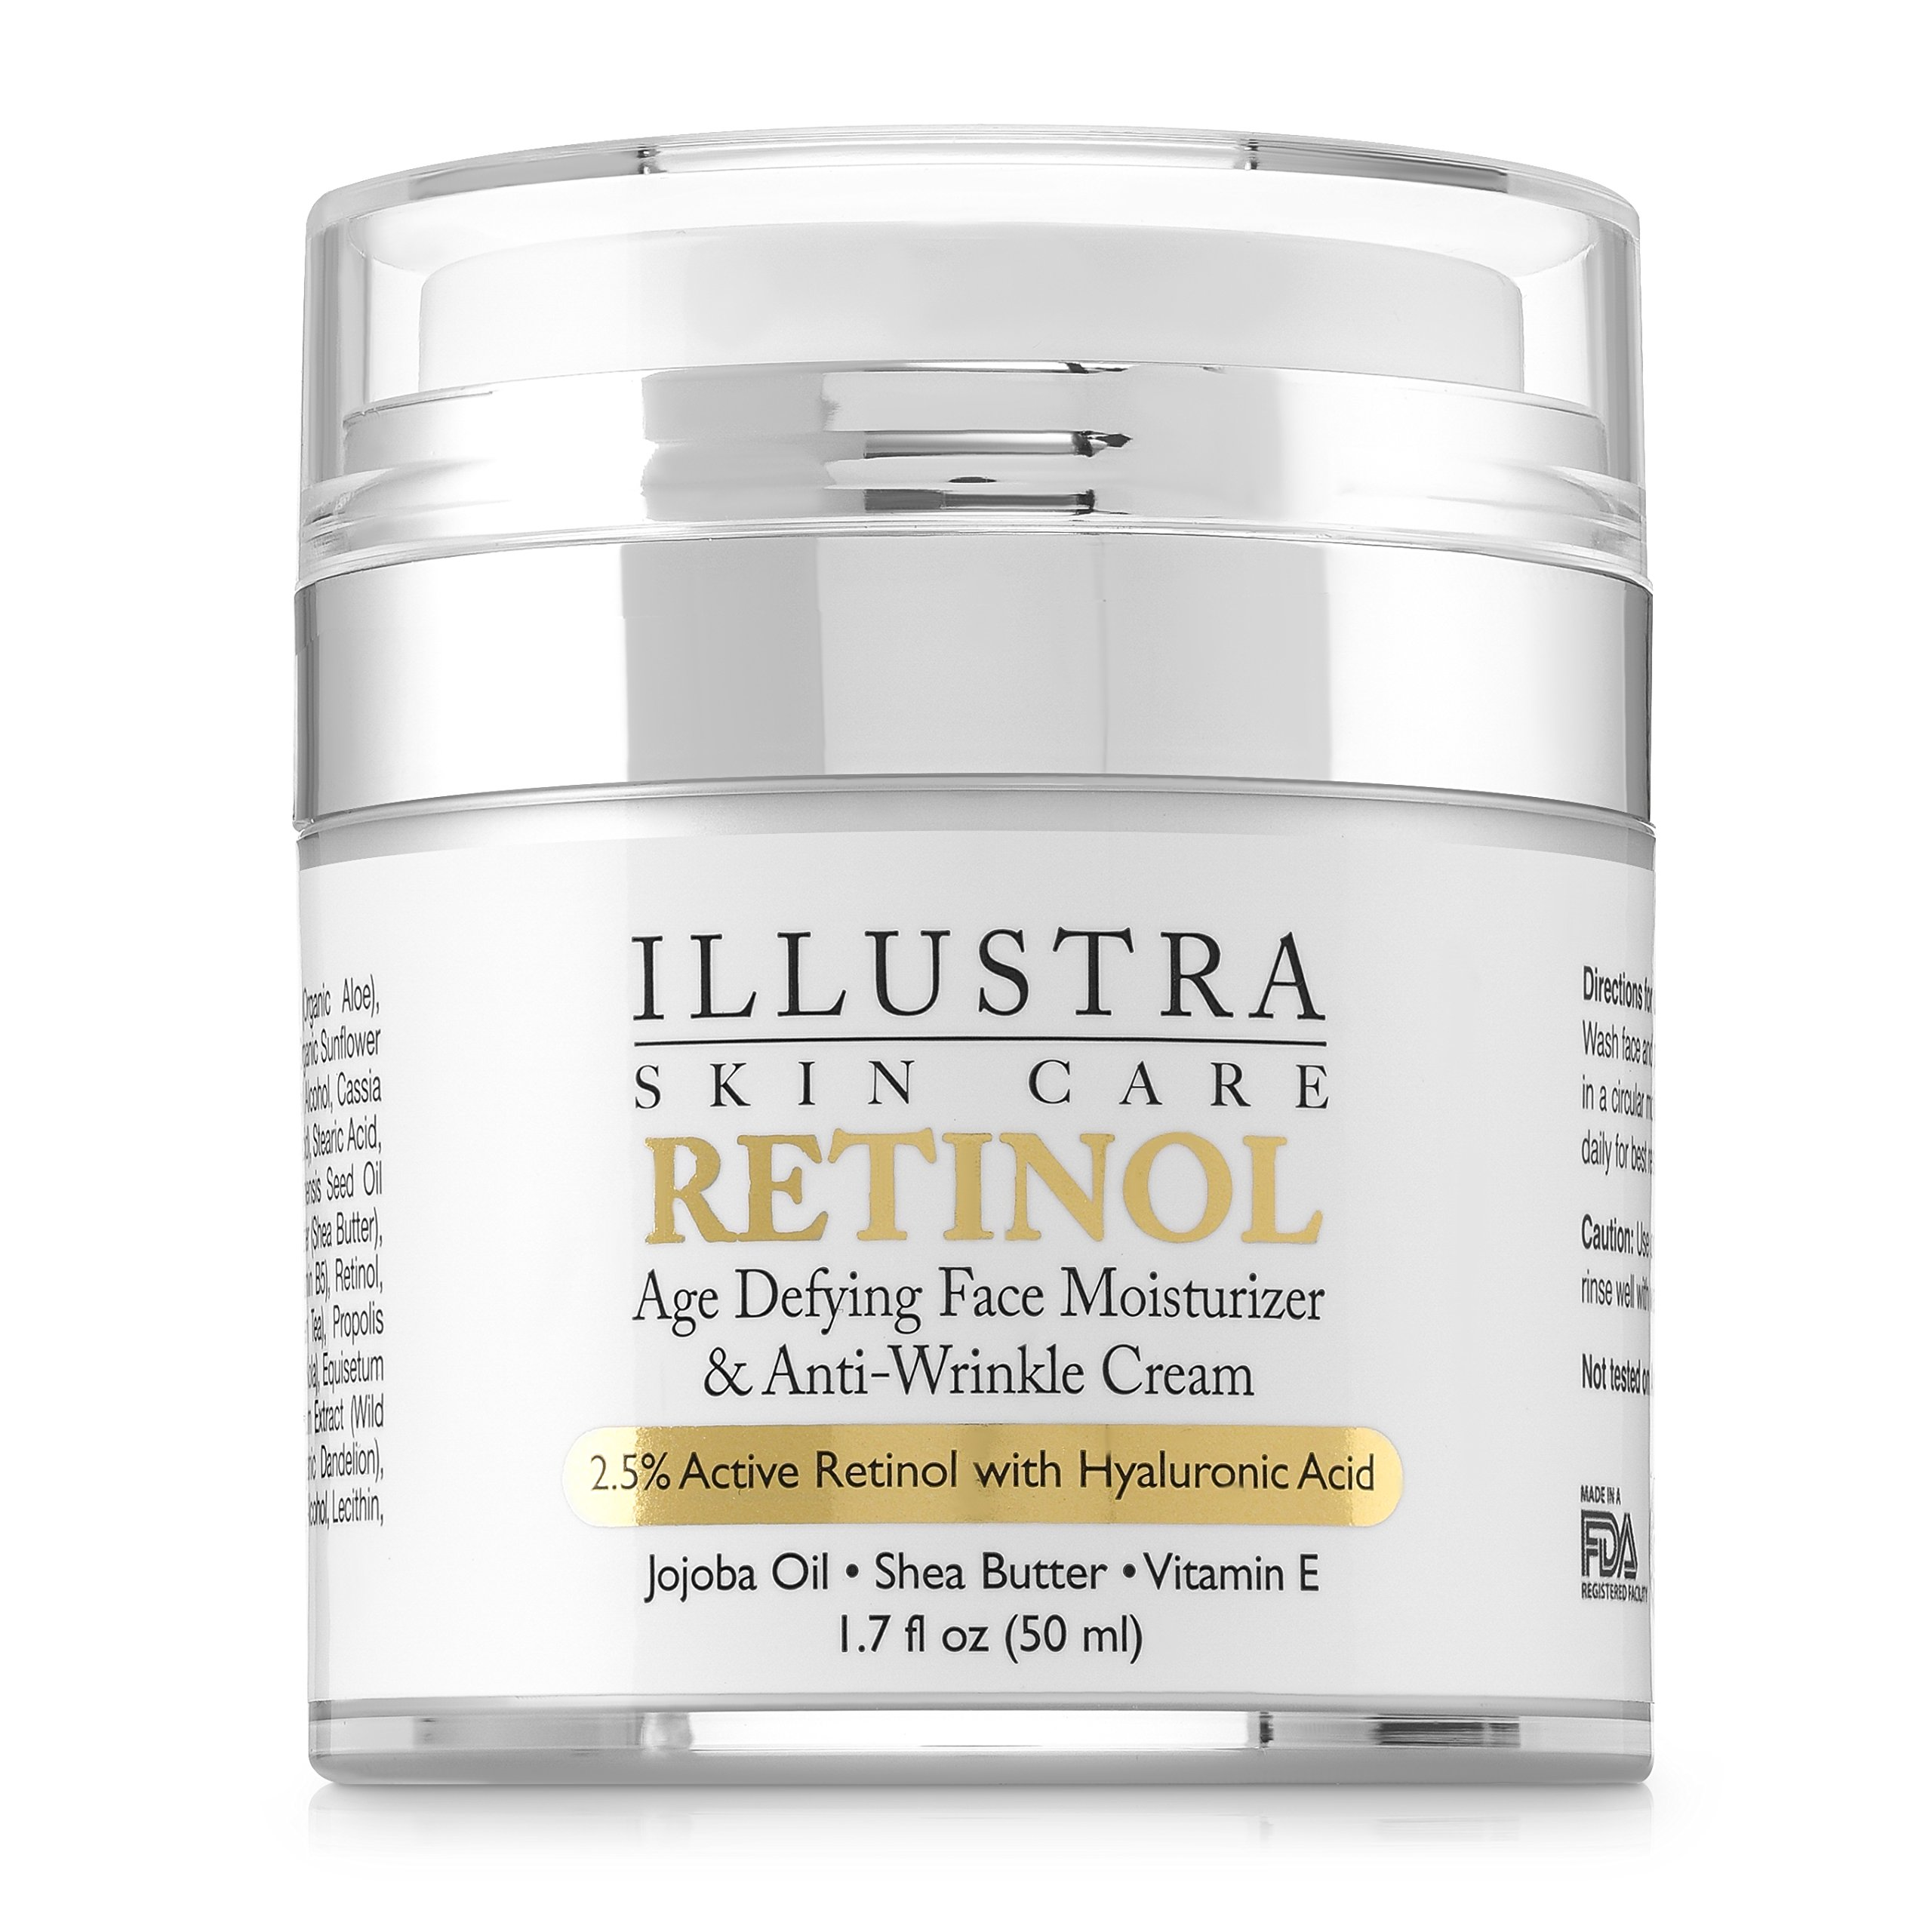 Best Retinol Anti Aging Anti Wrinkle For Face Cream Moisturizer by Illustra Skin Care - Organic Hyaluronic Acid, Natural Green Tea, Jojoba Oil, Shea Butter - Moisturizes & Hydrates Dry Skin by Illustra Skin Care